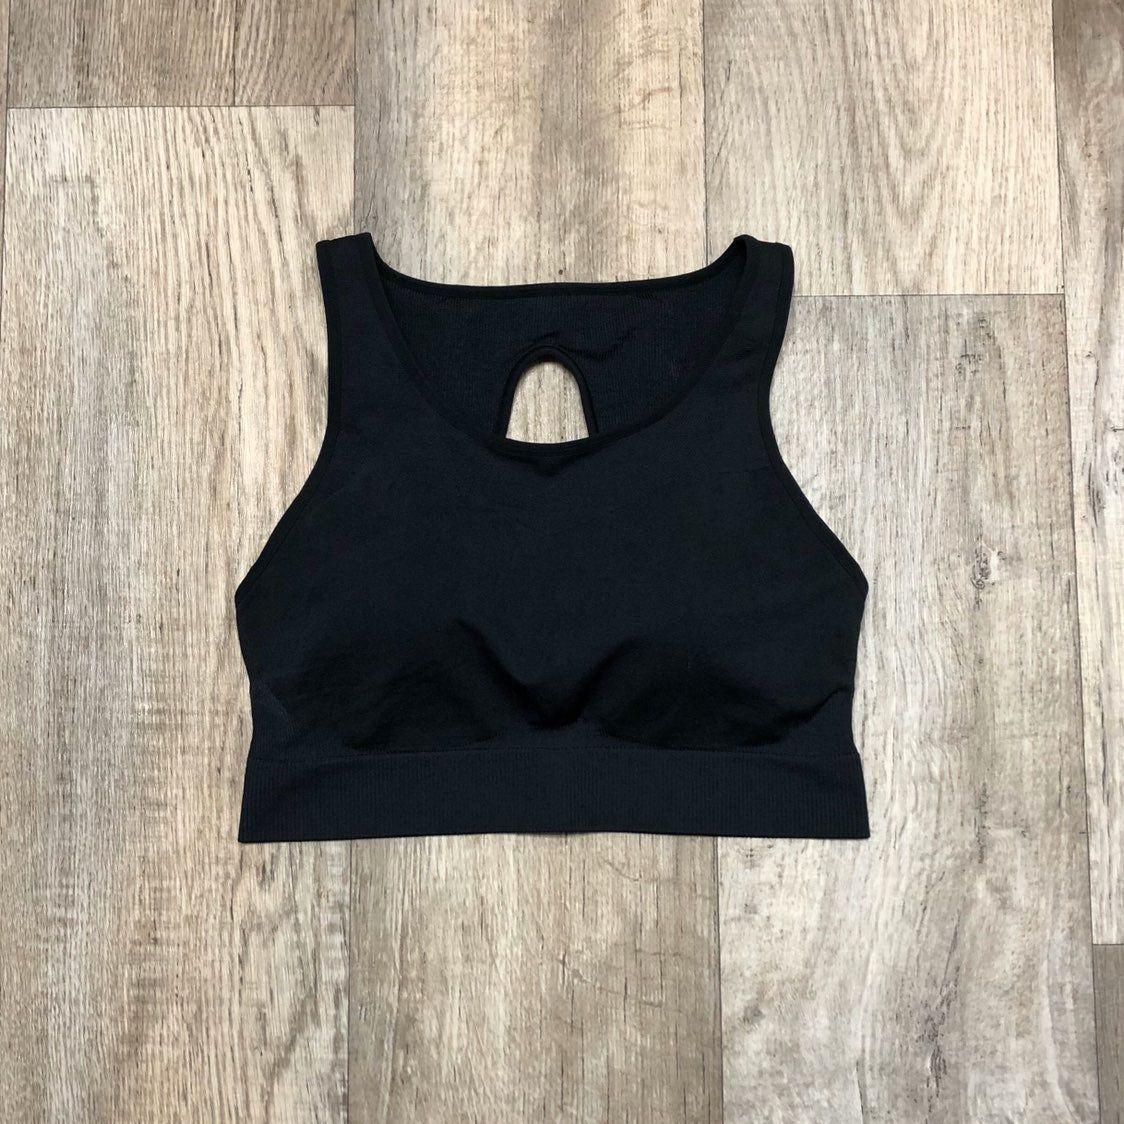 Nike Women's DriFIT Sports Bra / Bralette. Excellent used